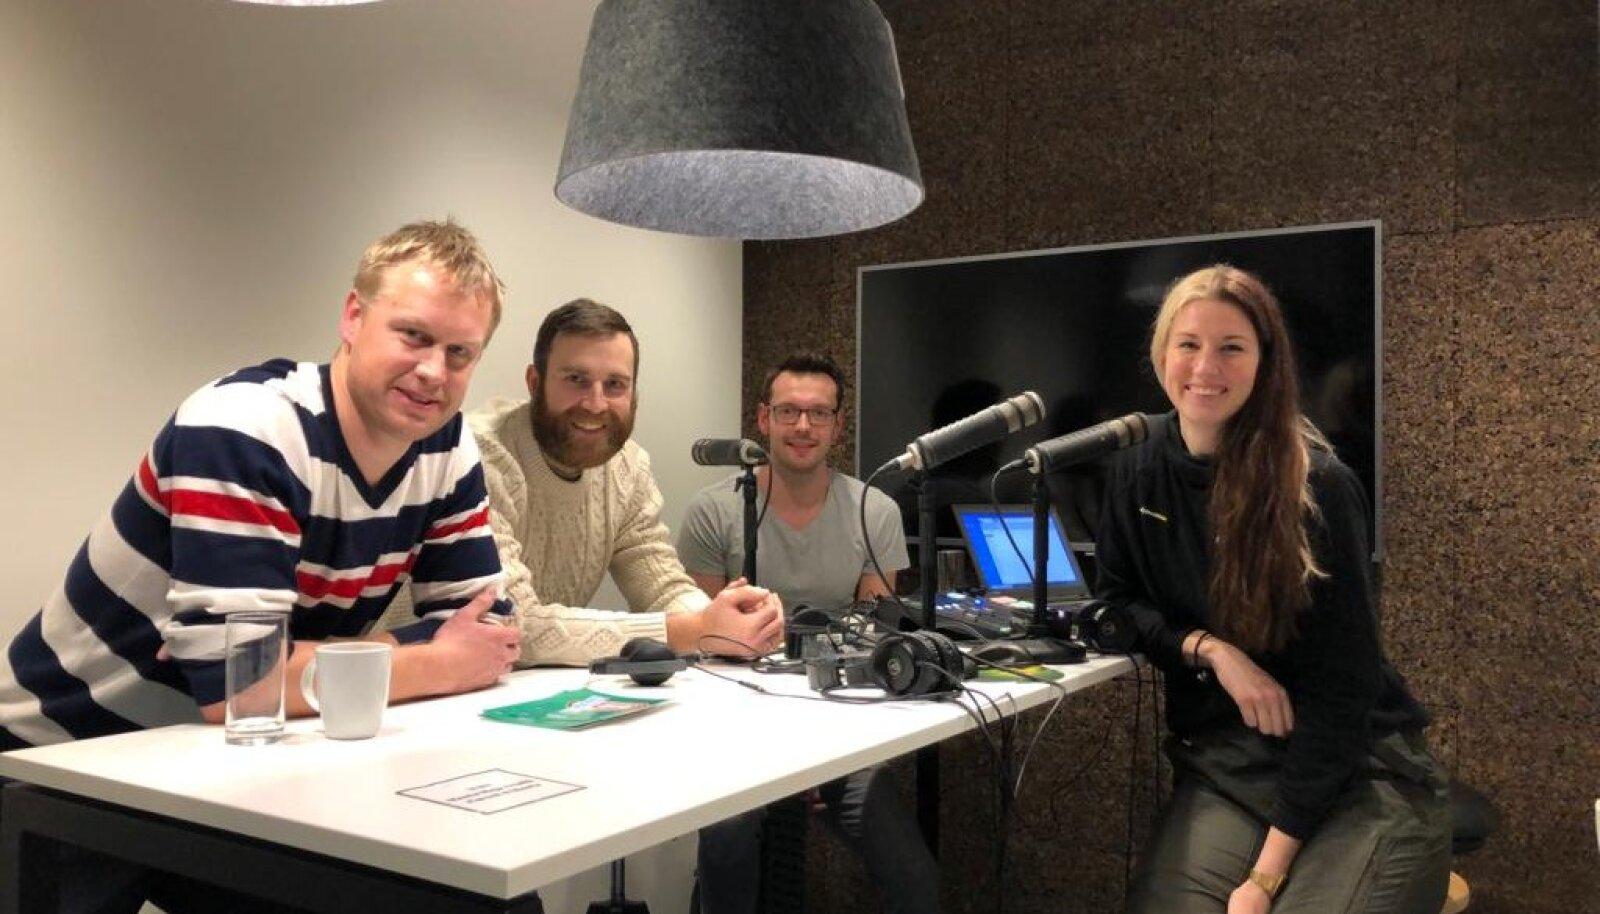 Fotol: Sten Esna, Andres Toobal, Karl Rinaldo ja Kadi Kullerkann Manta Maja stuudios.